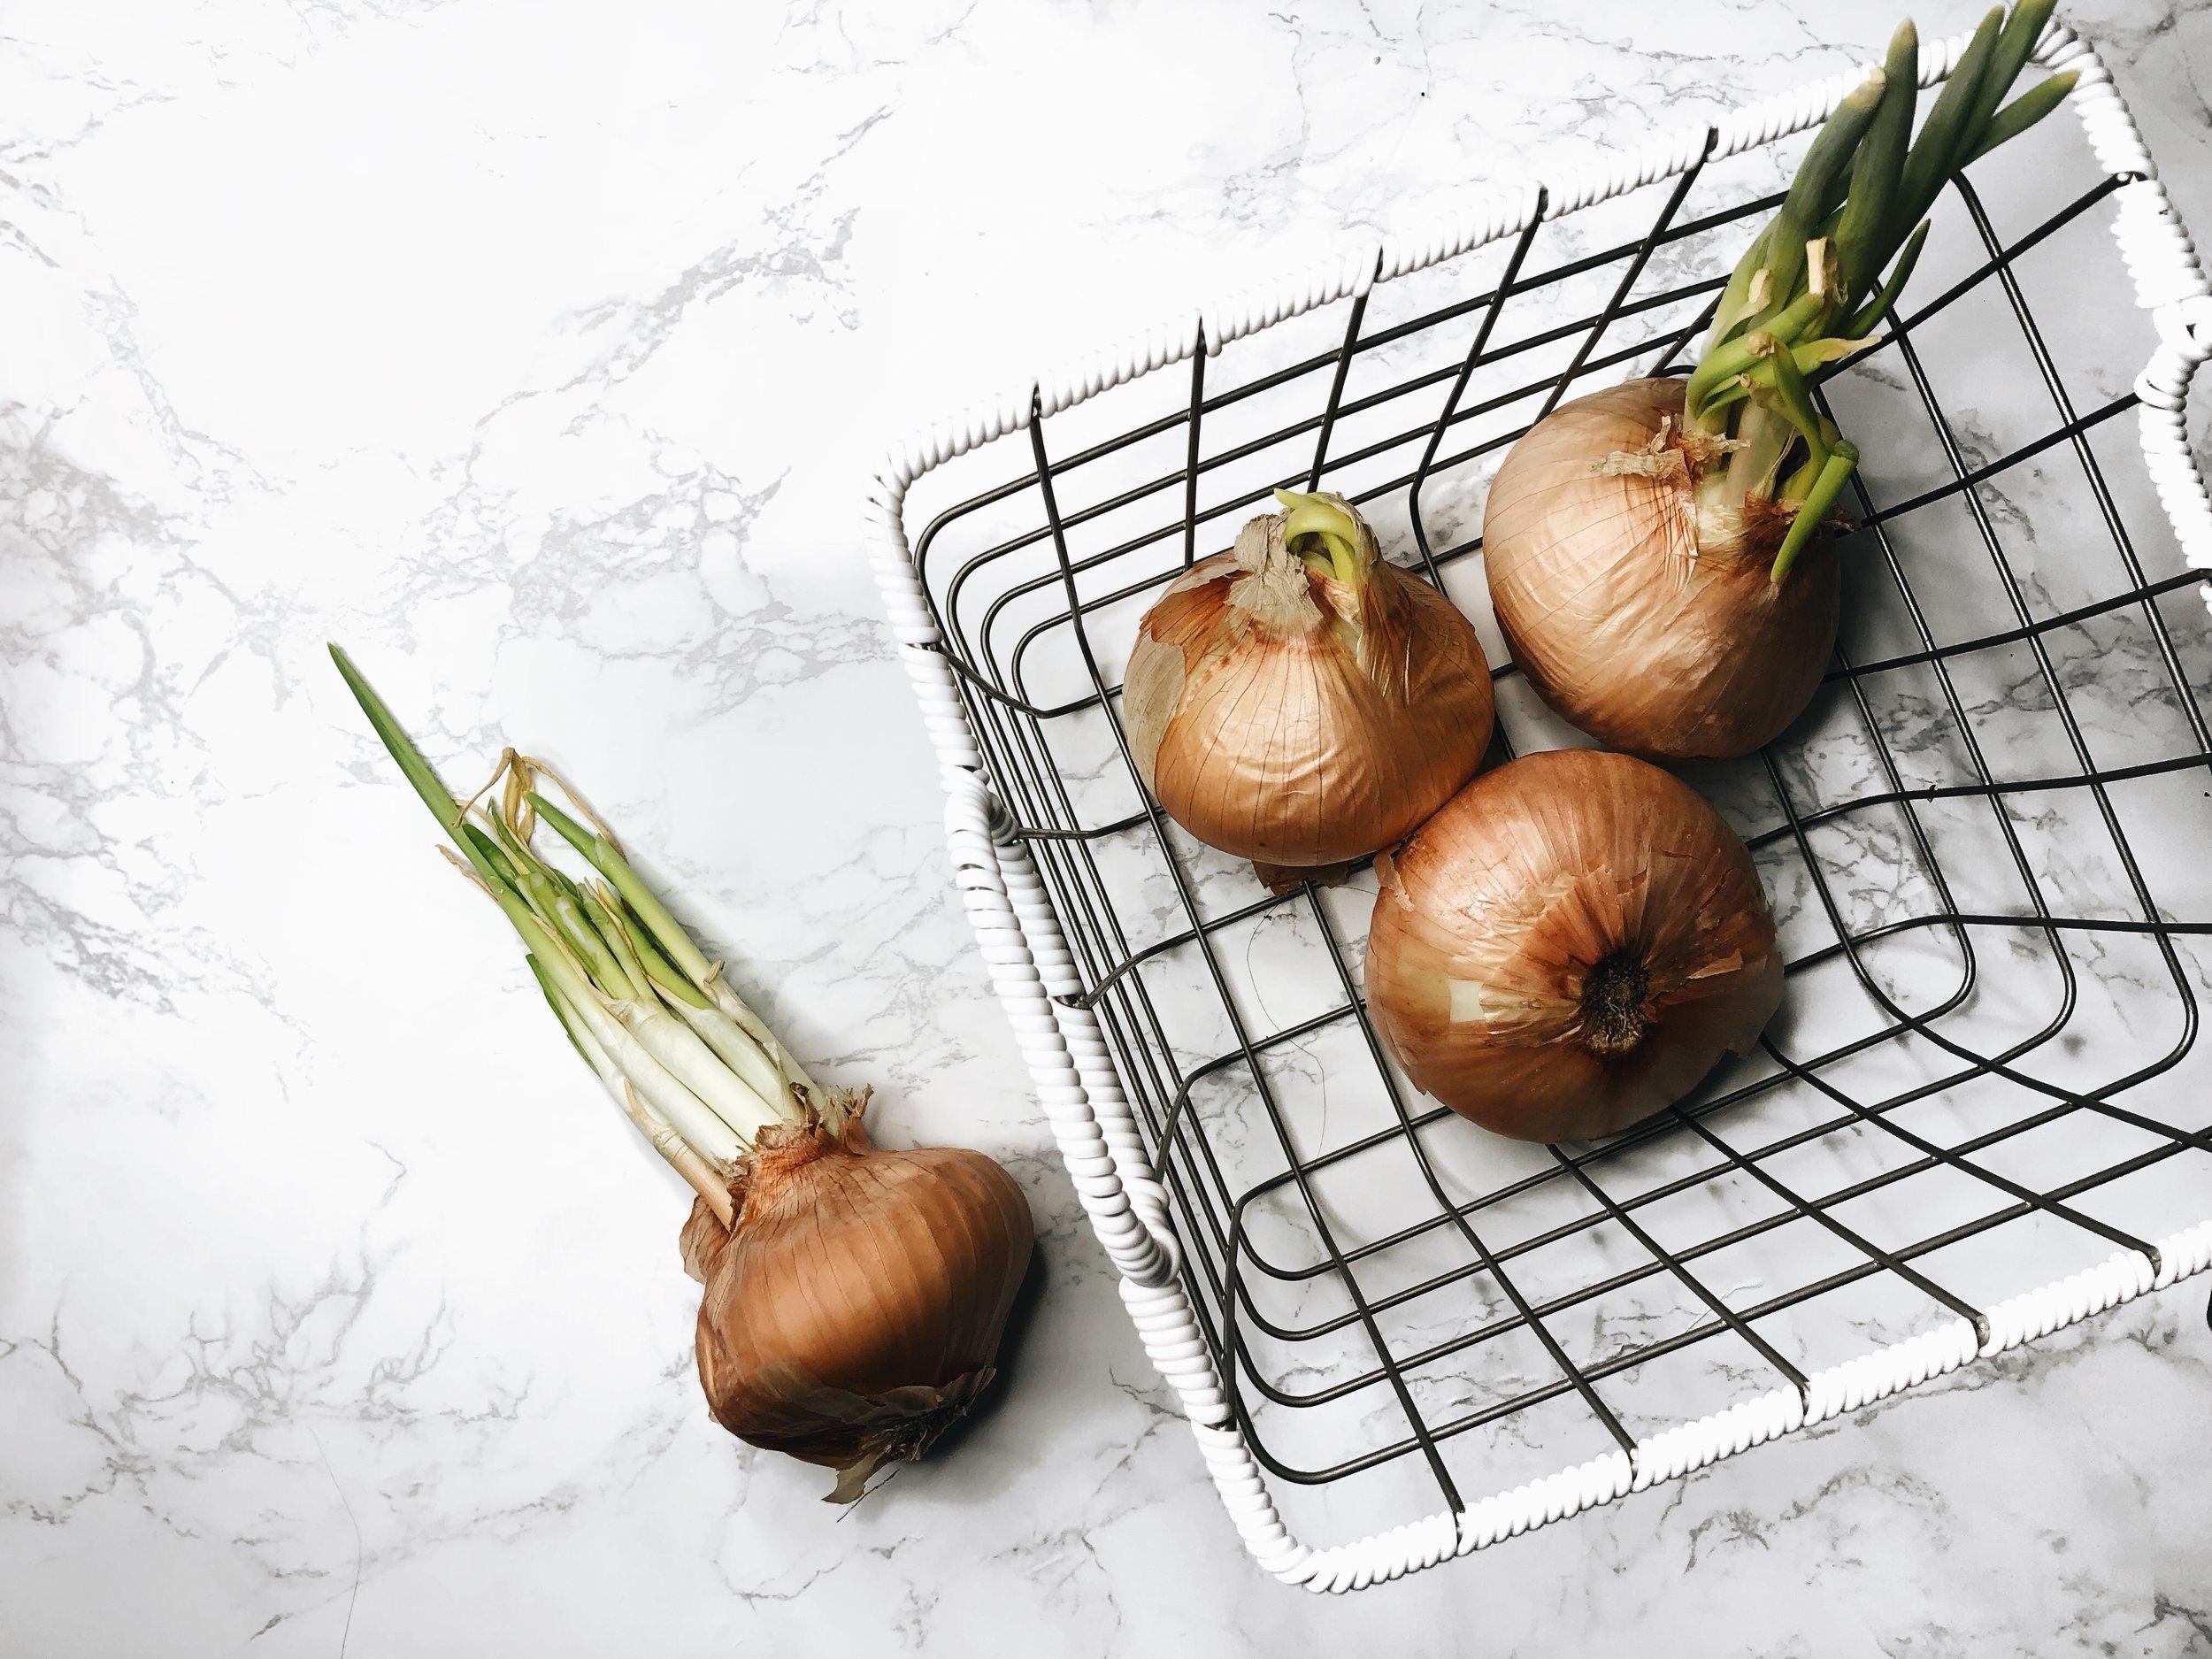 chanellecozette_onions.JPG